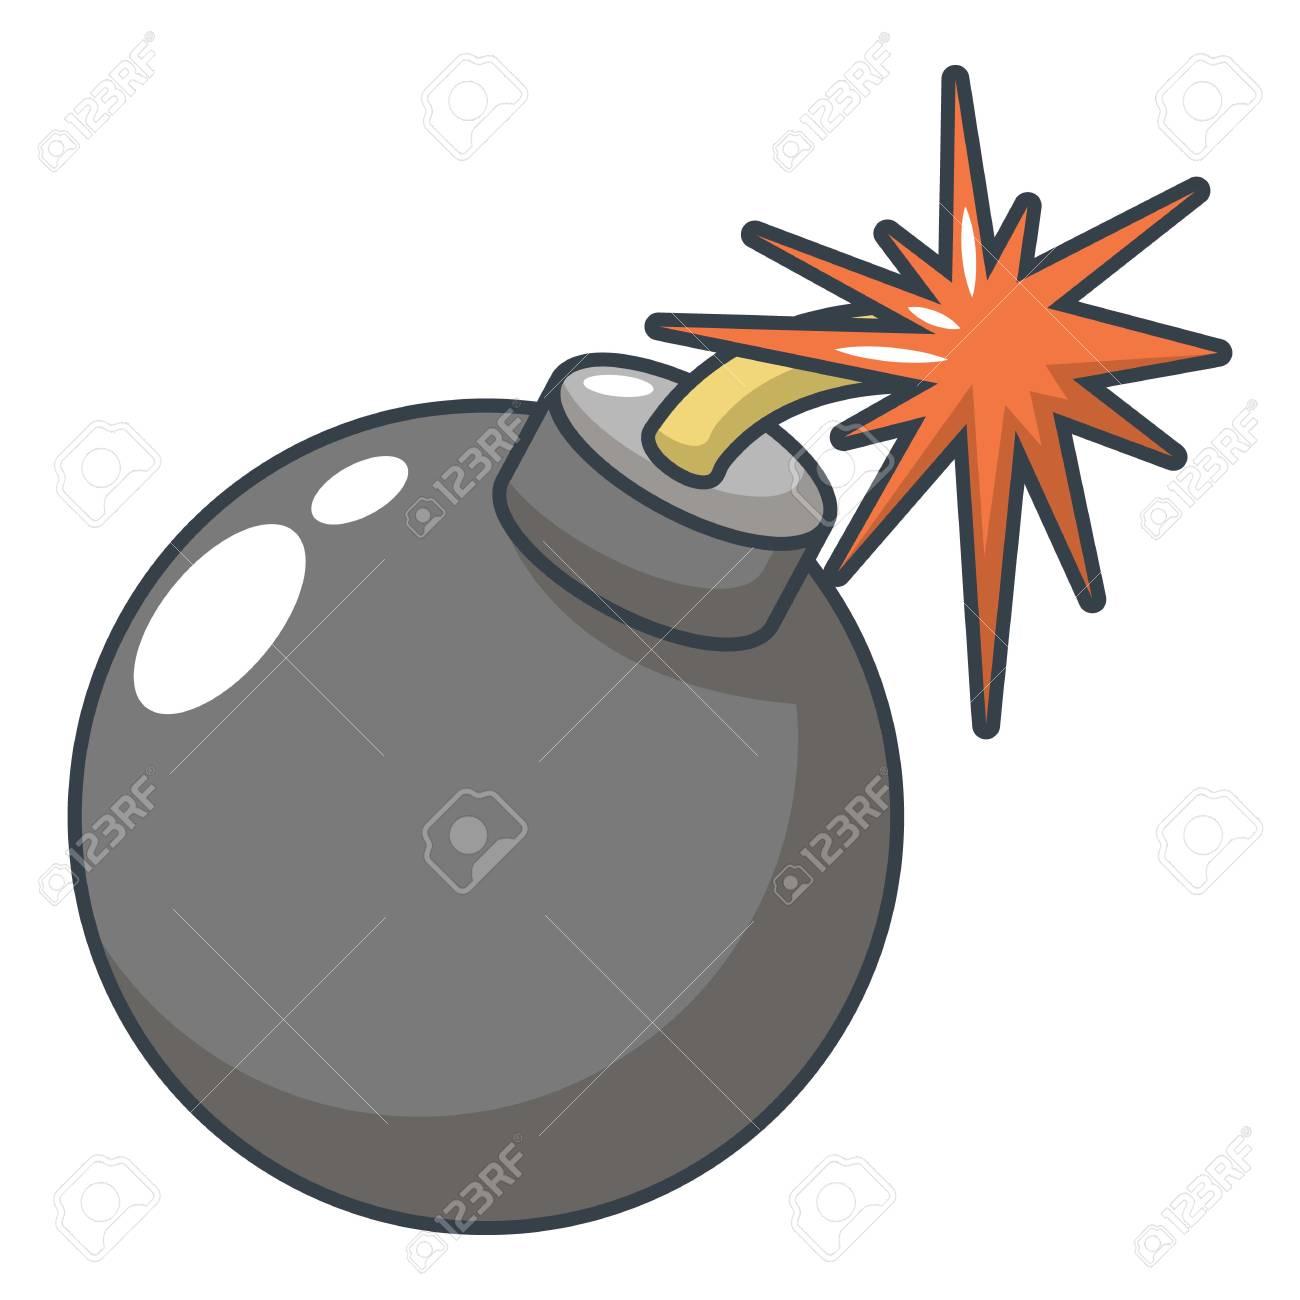 bomb icon cartoon illustration of bomb vector icon for web royalty rh 123rf com bomb vector graphic bomb vector graphic